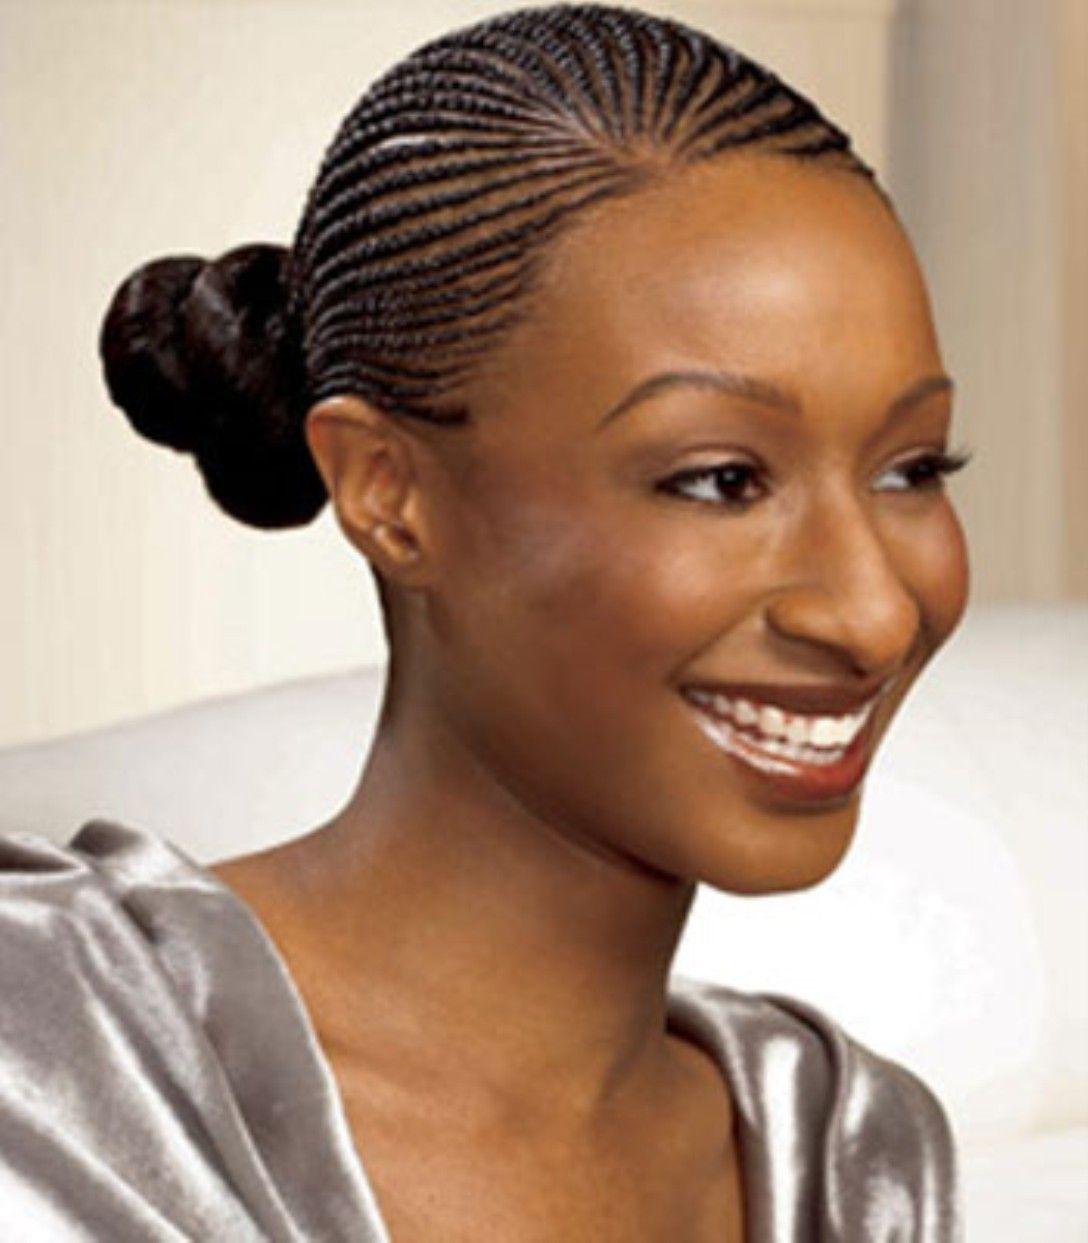 Tremendous Micro Braids Micro Braids Hairstyles And Braid Hairstyles On Short Hairstyles For Black Women Fulllsitofus